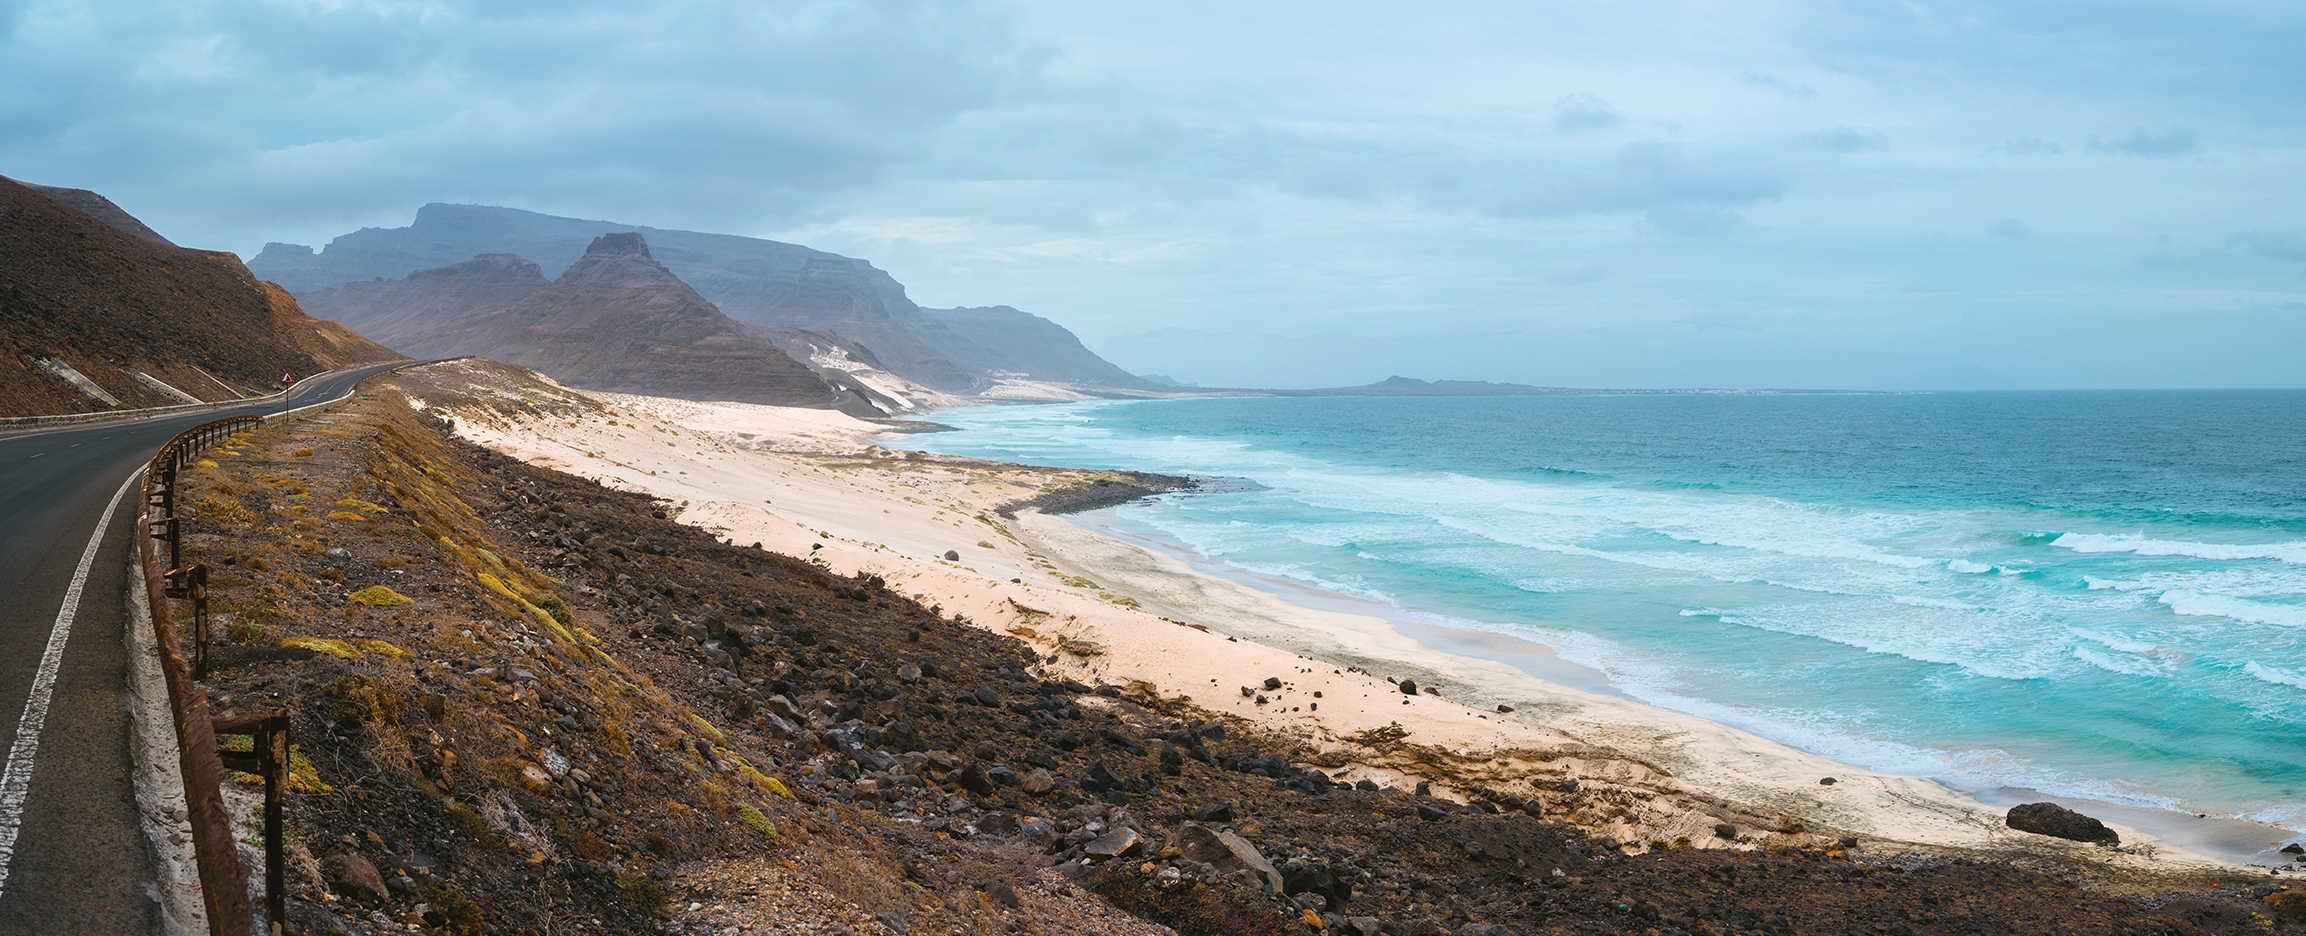 destino poco turistico carretera en la playa sao vicente